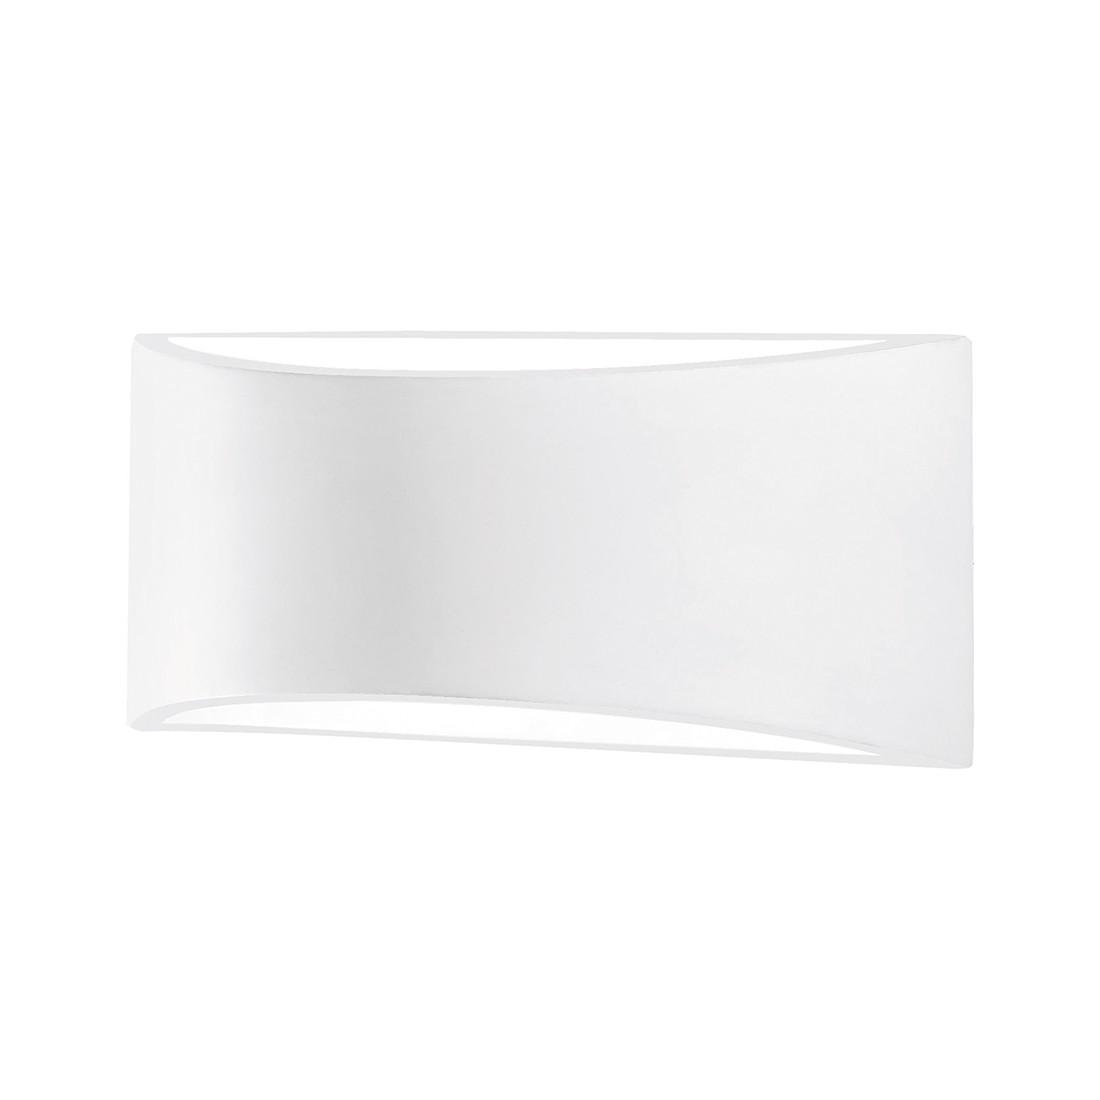 Wandleuchte Zirkow ● Stein/Gips ● Weiß ● 1-flammig- FLI Leuchten A+